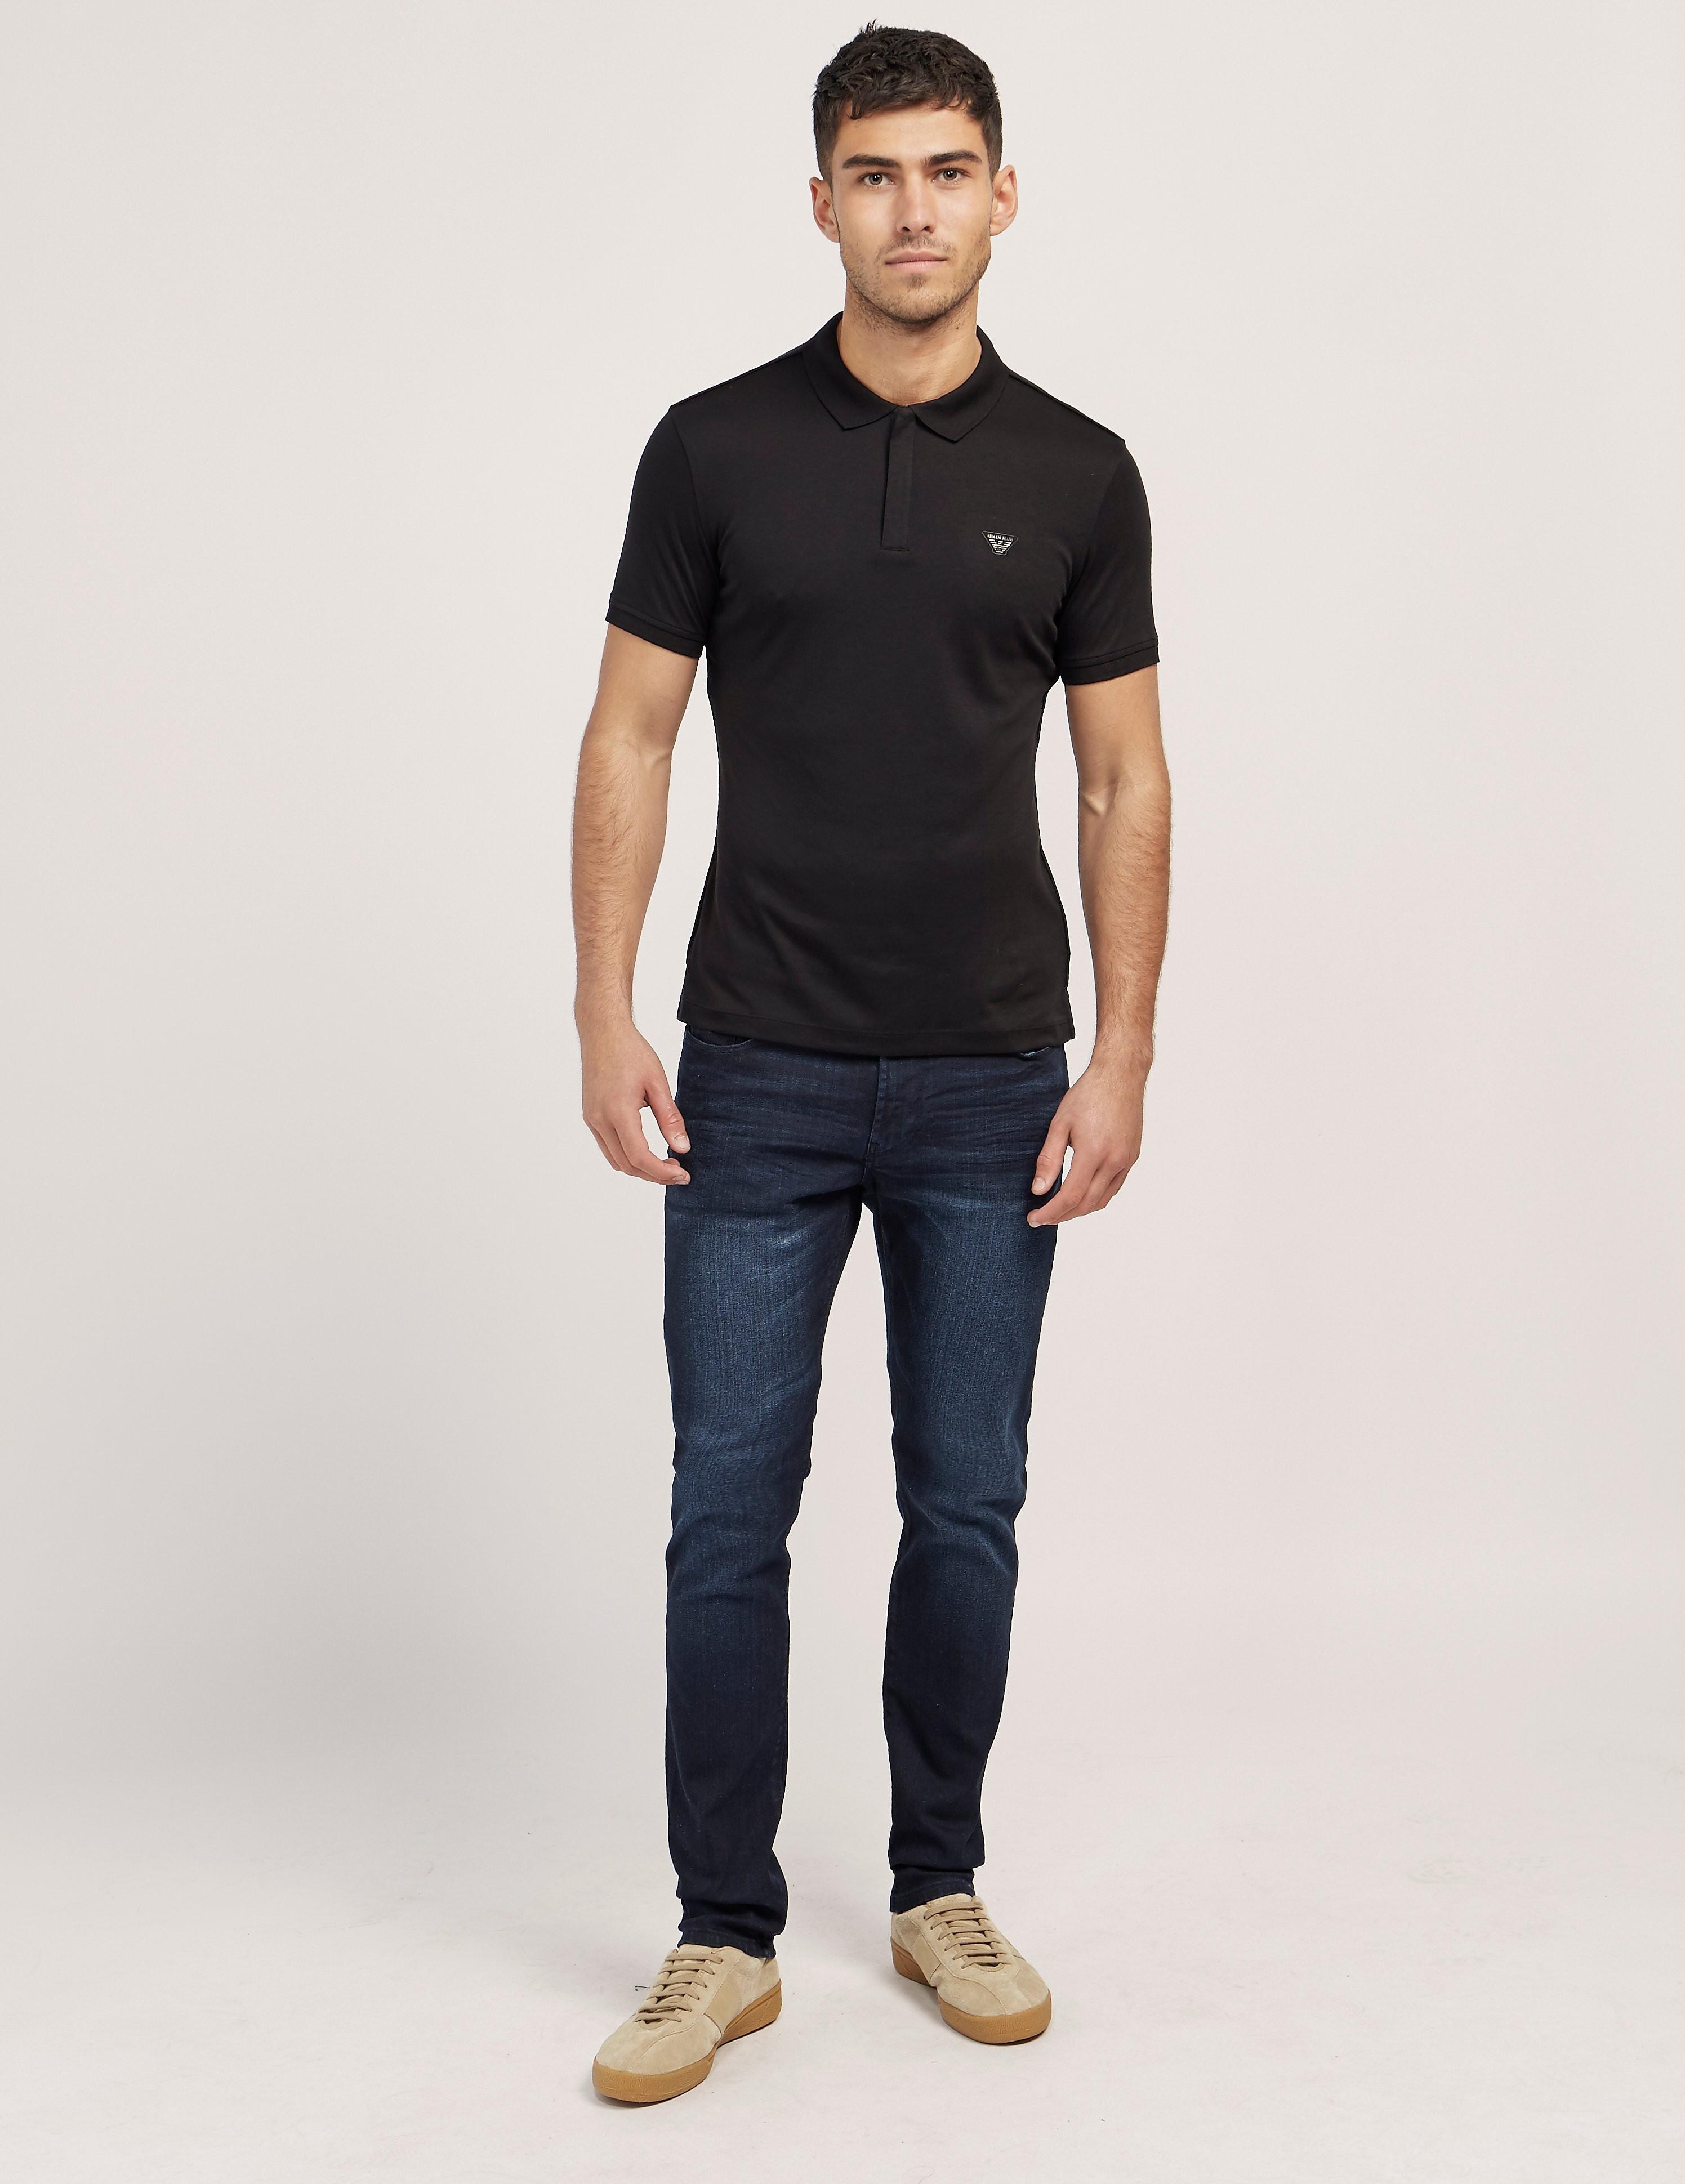 Armani Jeans Jersey Short Sleeve Polo Shirt